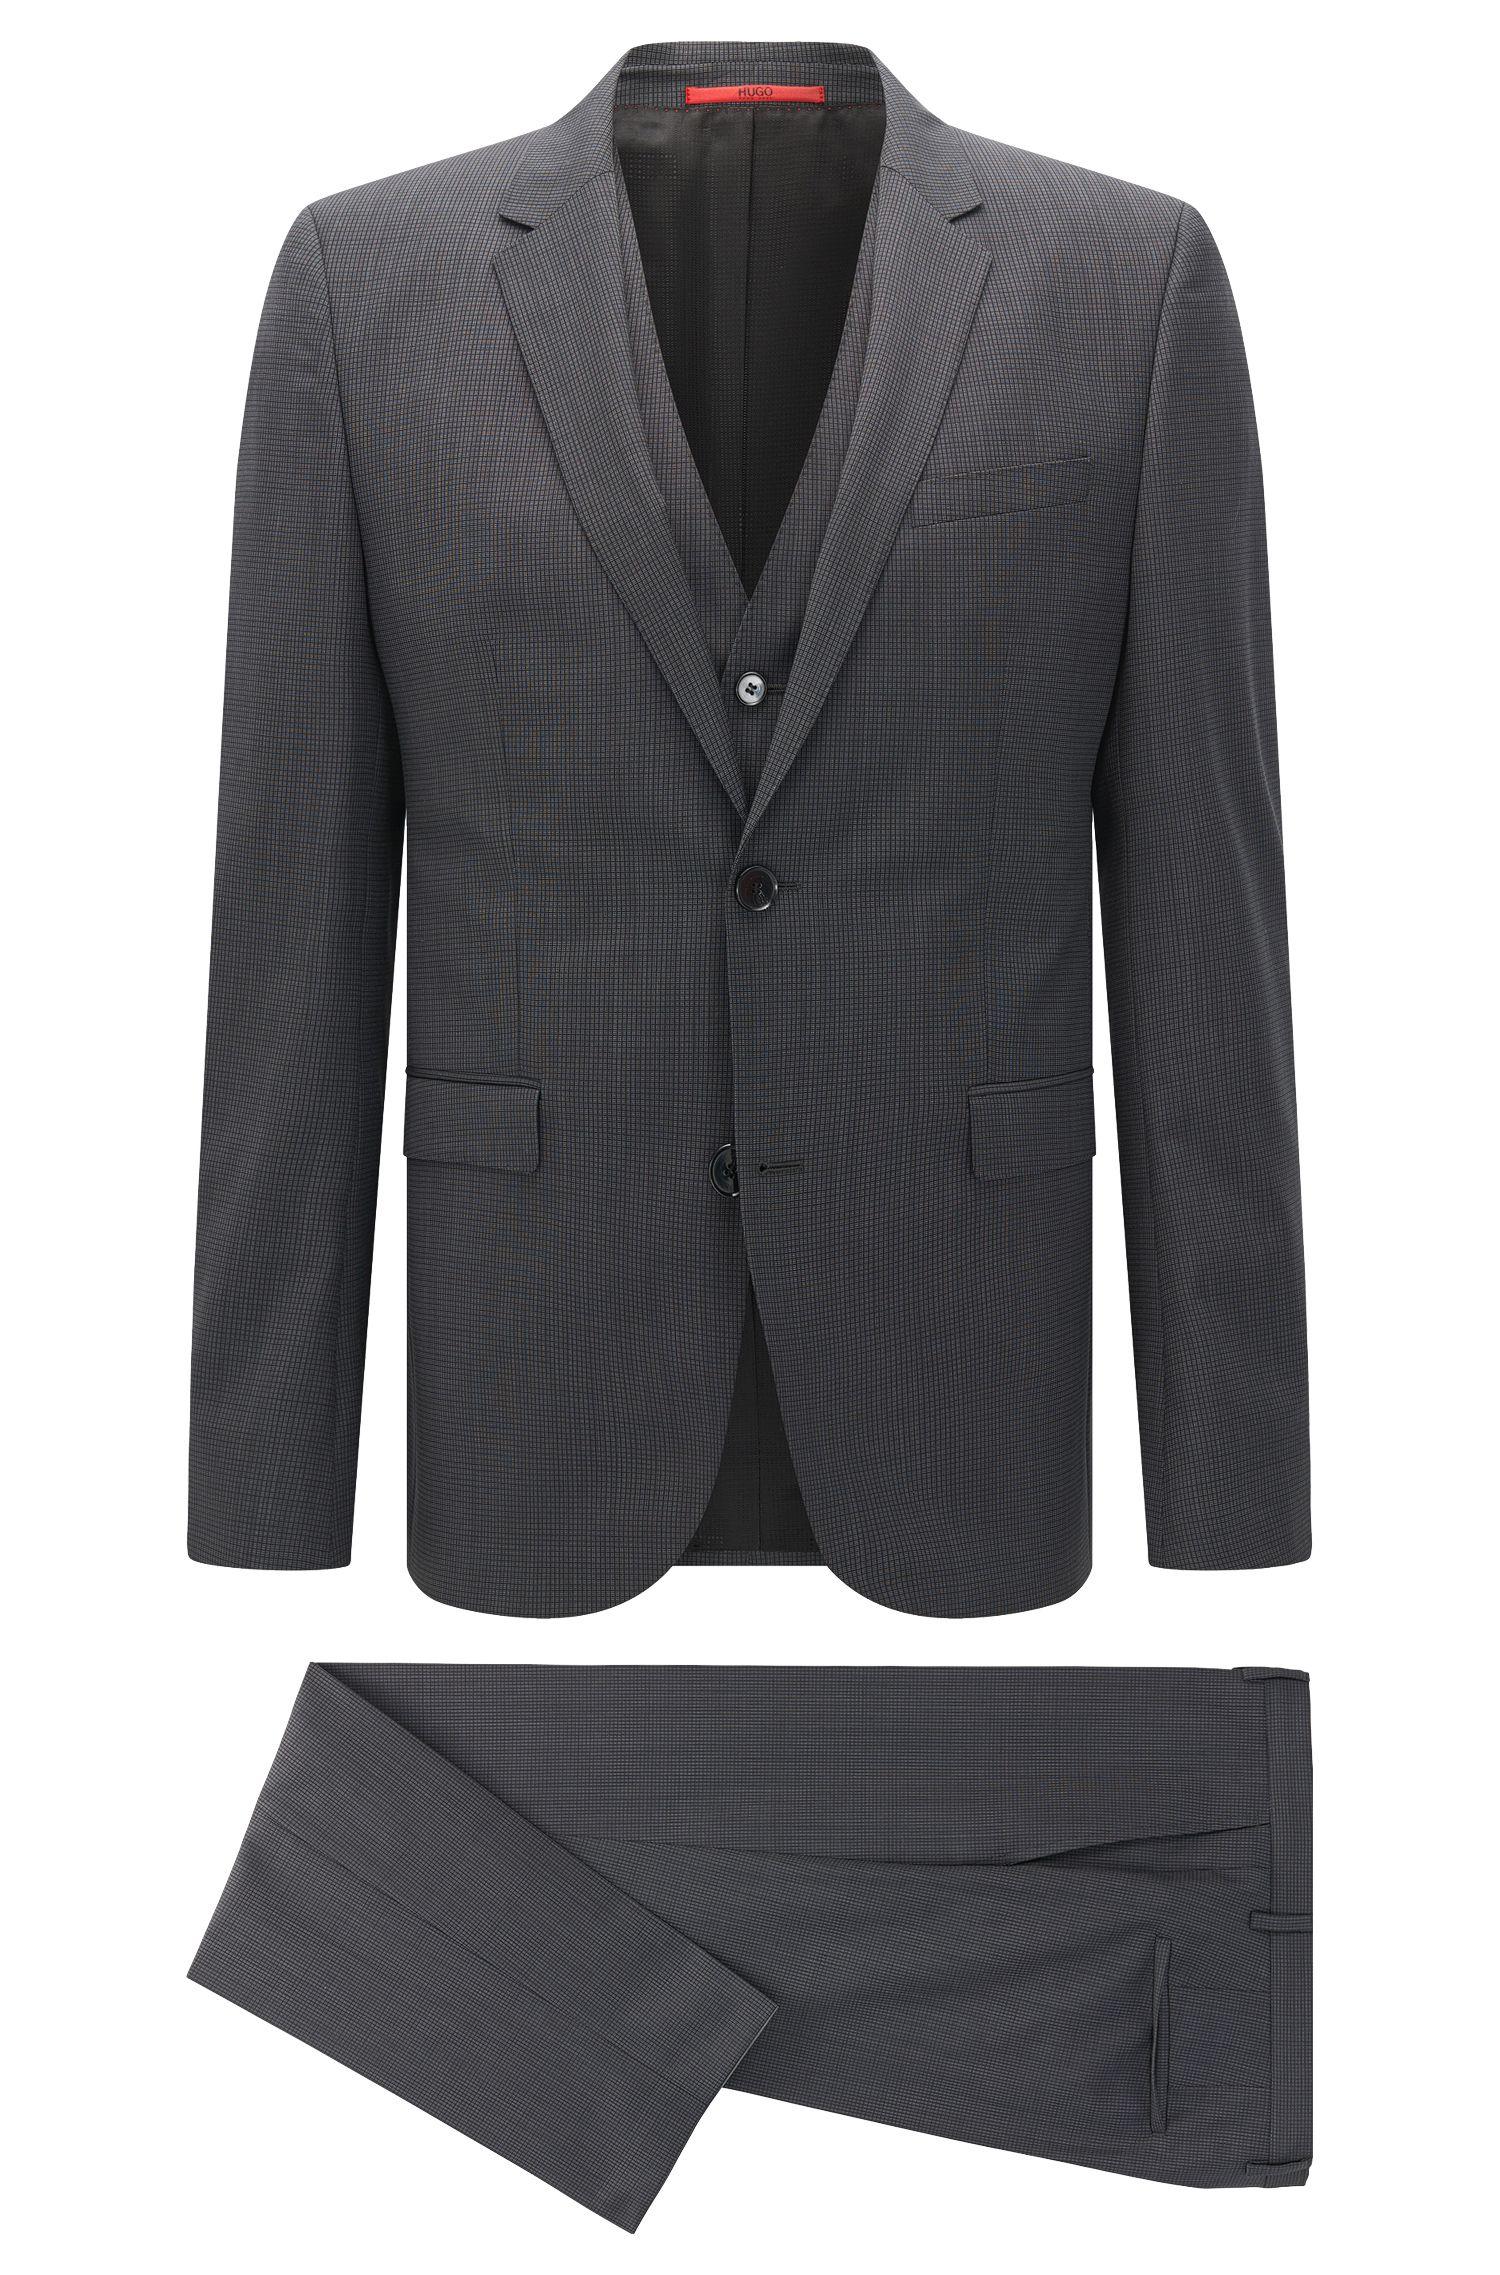 'Adwart/Wilard/Hets' | Slim Fit, Italian Super 120 Virgin Wool 3-Piece Suit